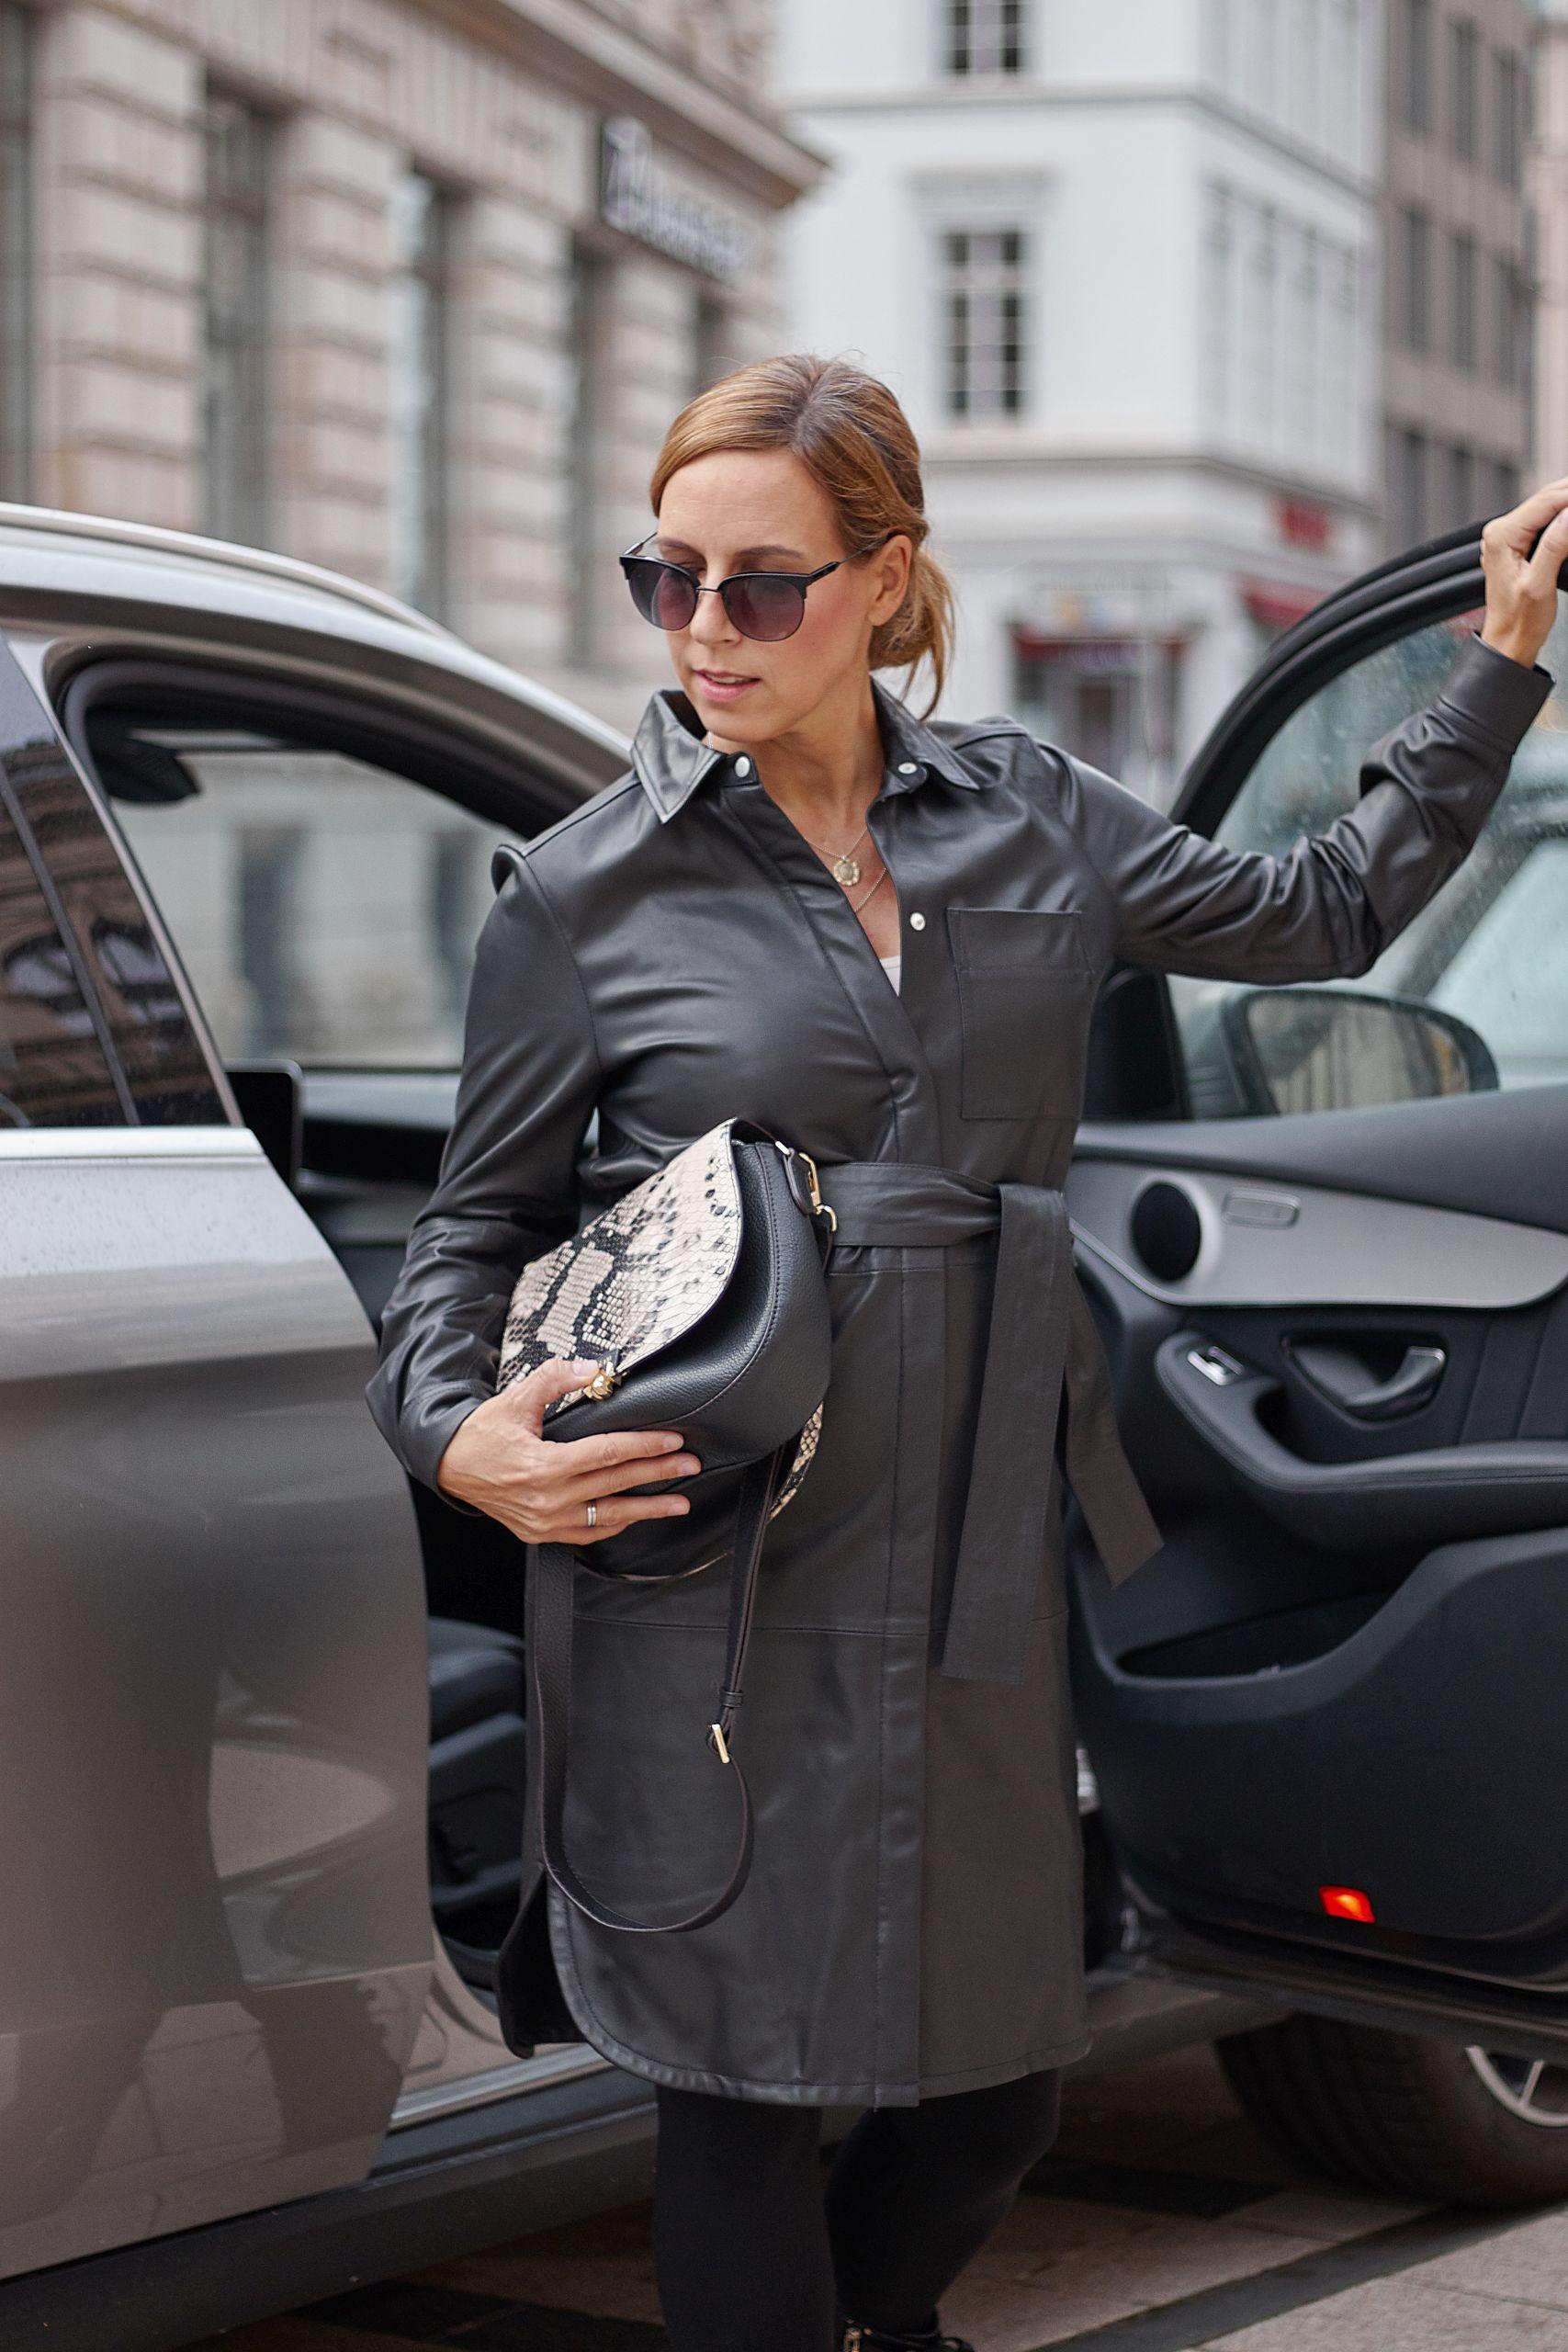 InWear Lederkleid kombinieren zur Zoélu Tasche